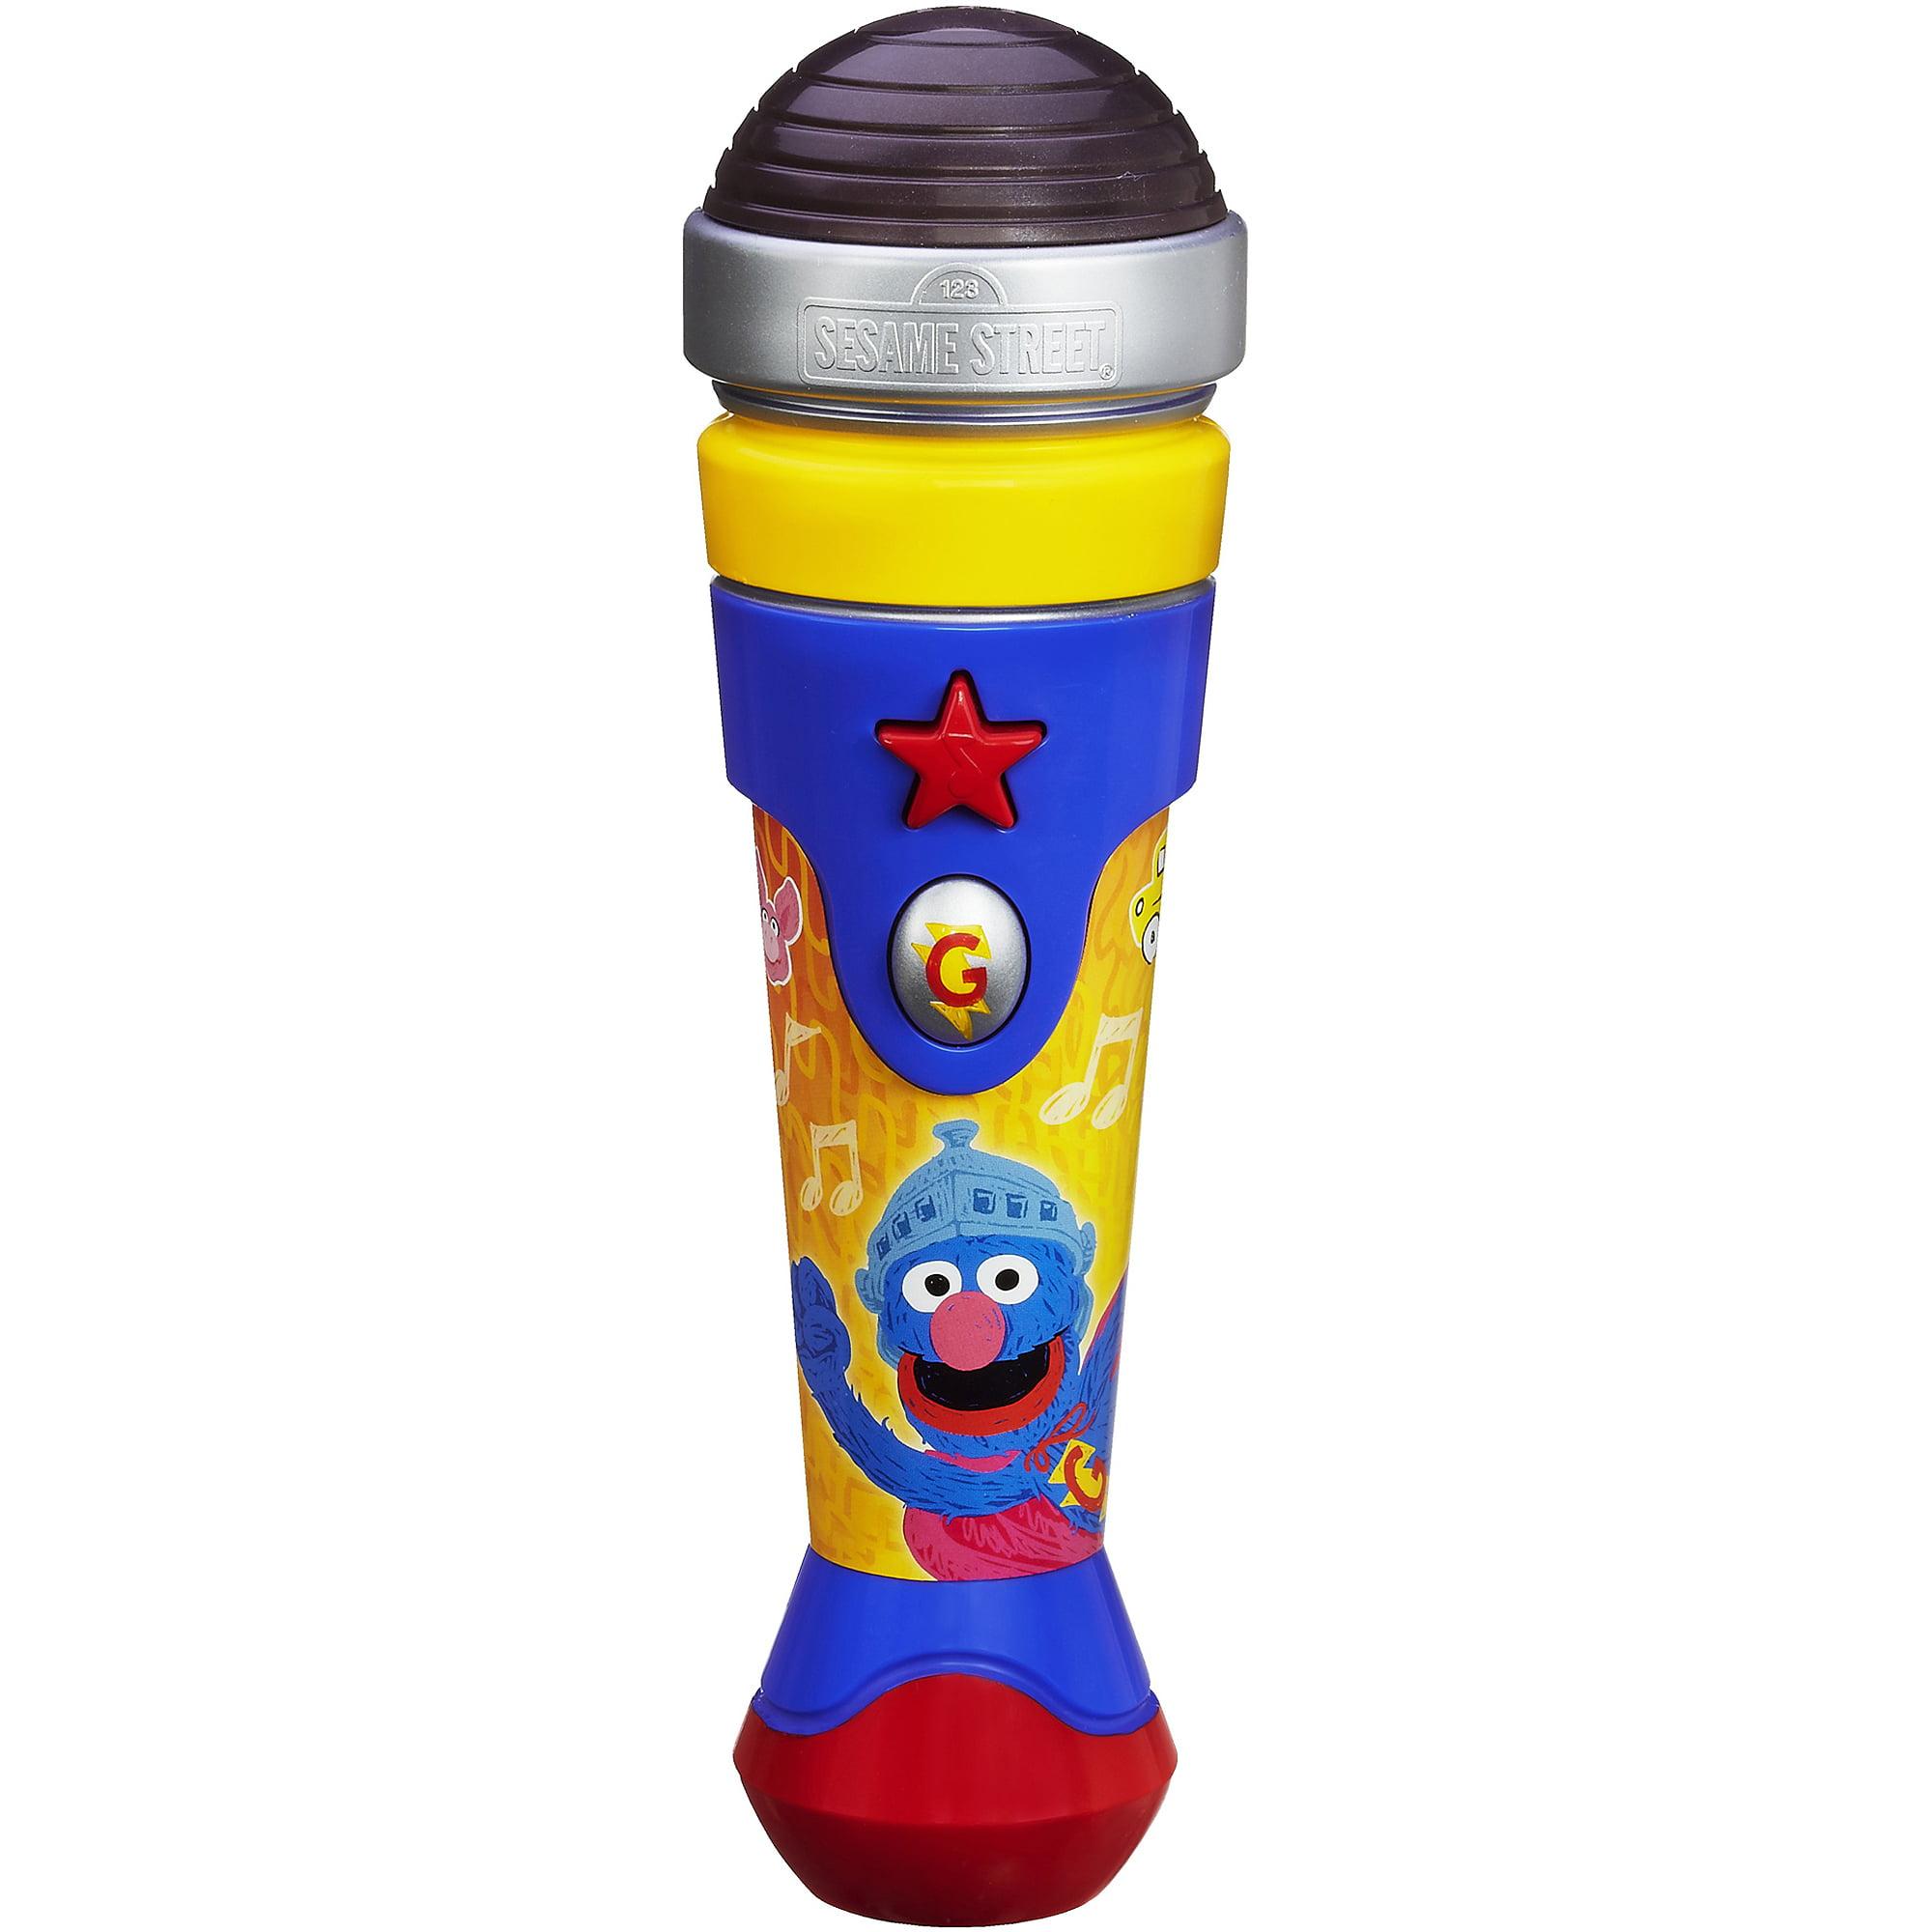 Sesame Street Ses Super Grover Microphone